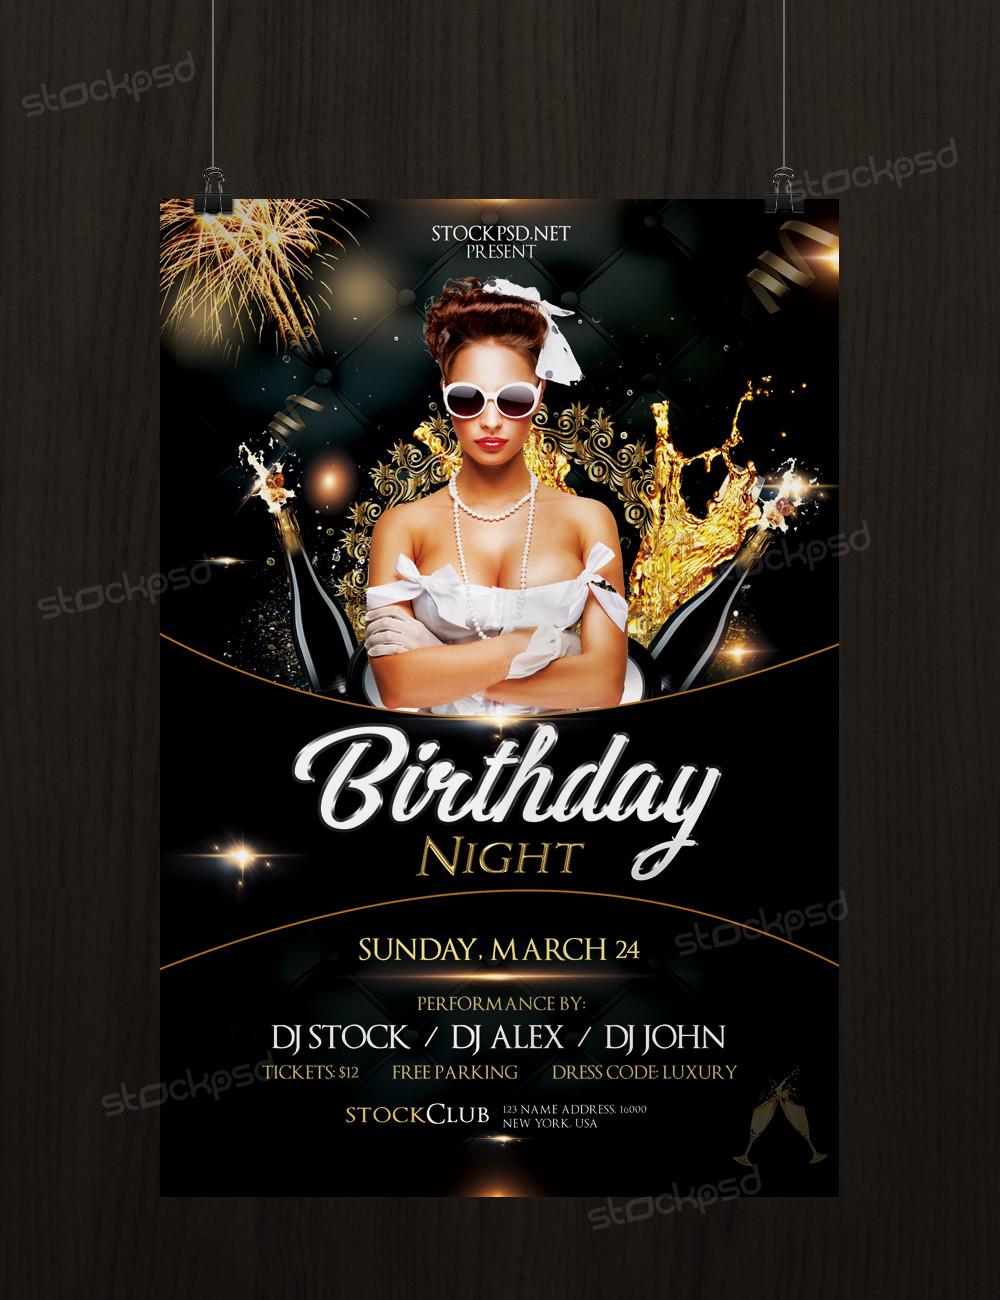 Birthday Gold Night Free Luxury Psd Flyer Template Stockpsd